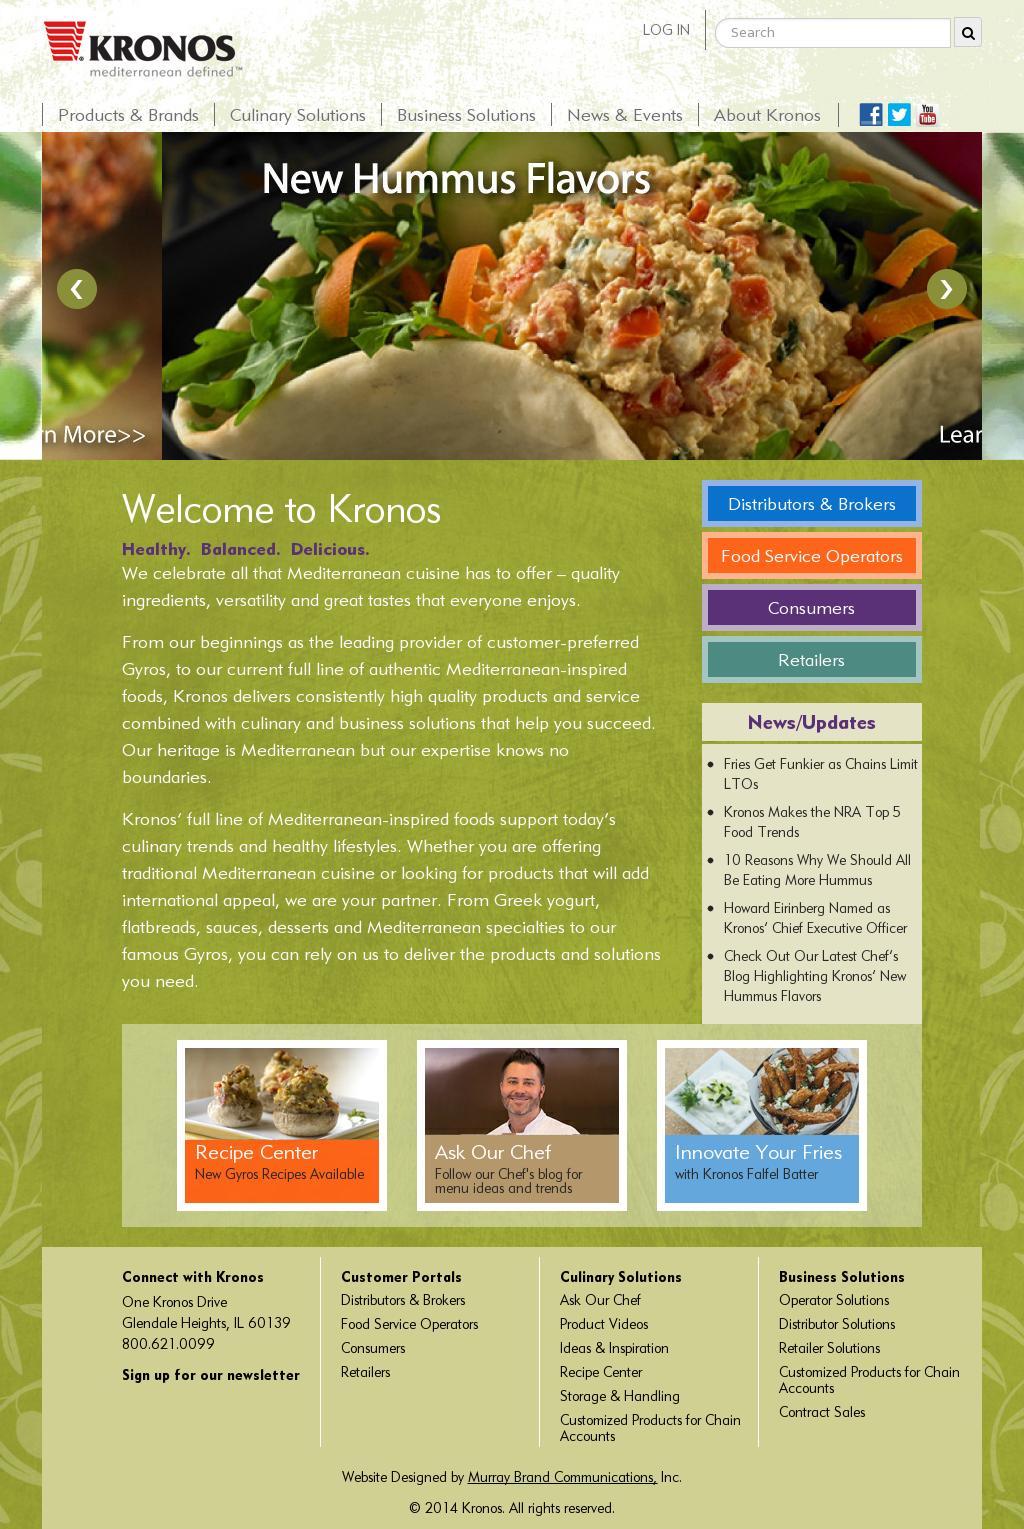 Kronosfoodsinc Competitors, Revenue and